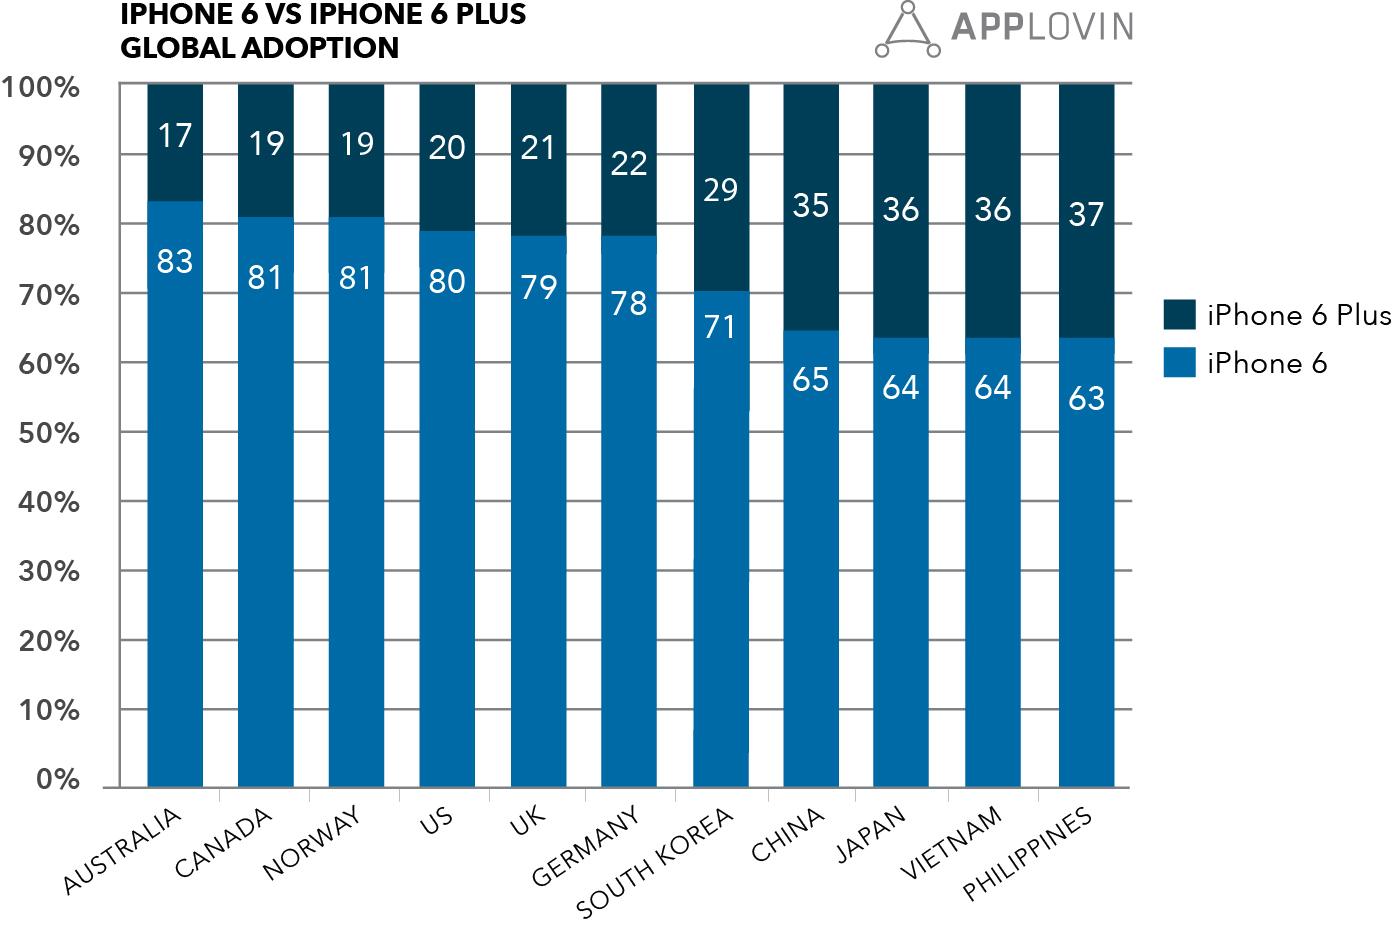 Applovin Iphone6 Global Adoption Chart Final